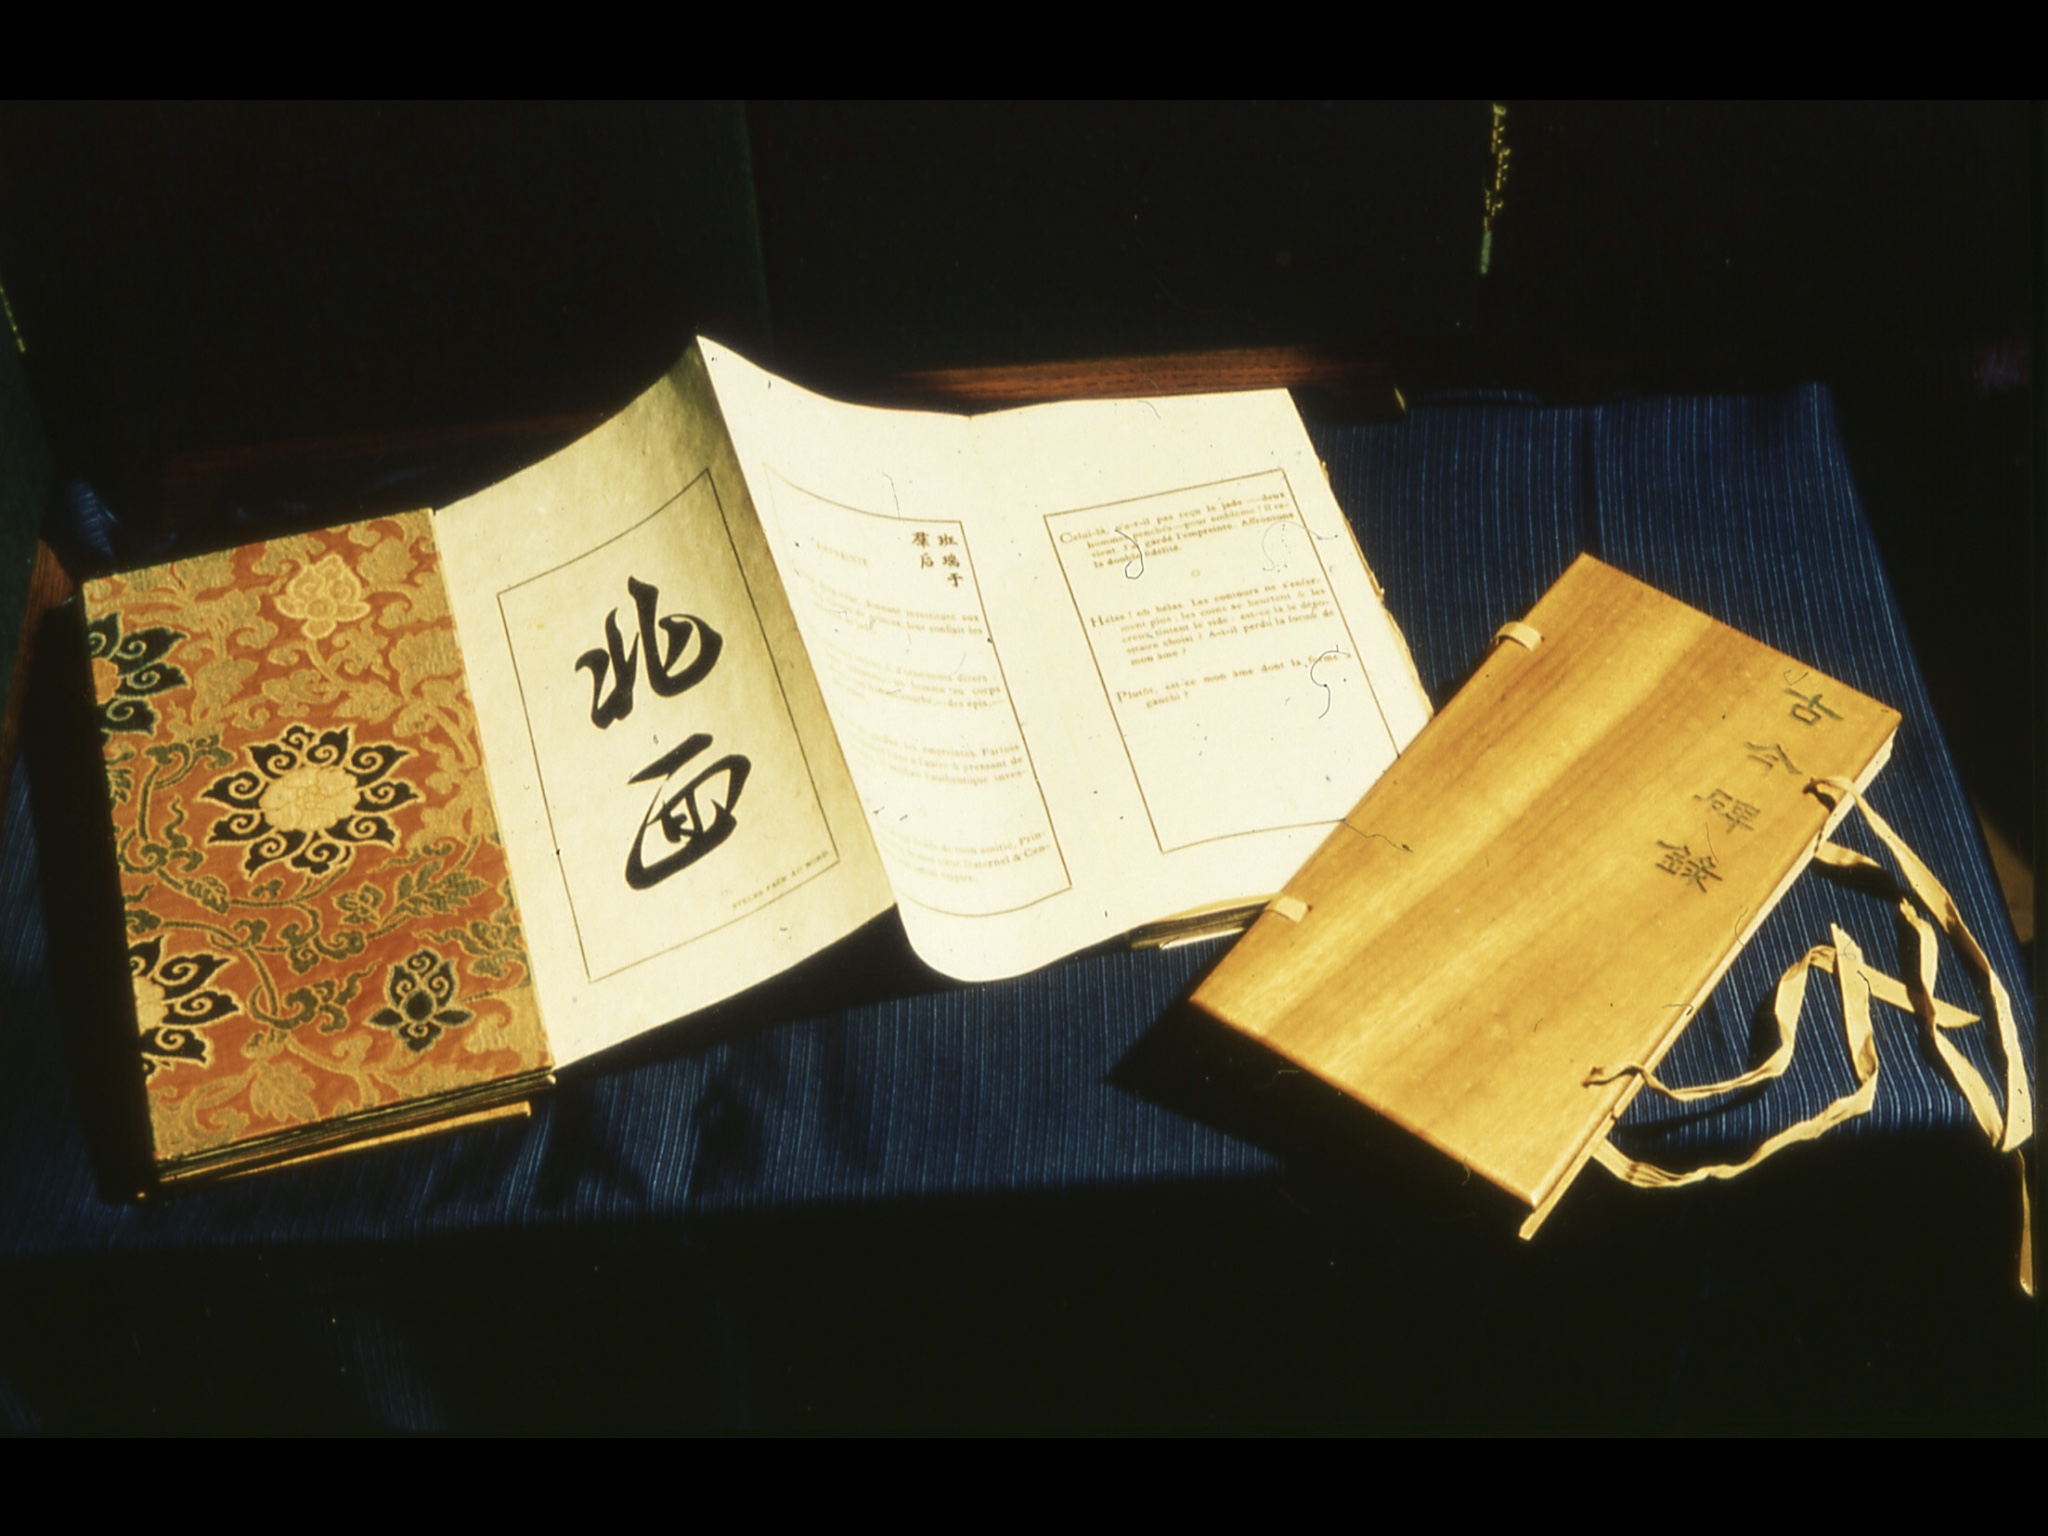 Stèles,  the original edition,Beijing,1912